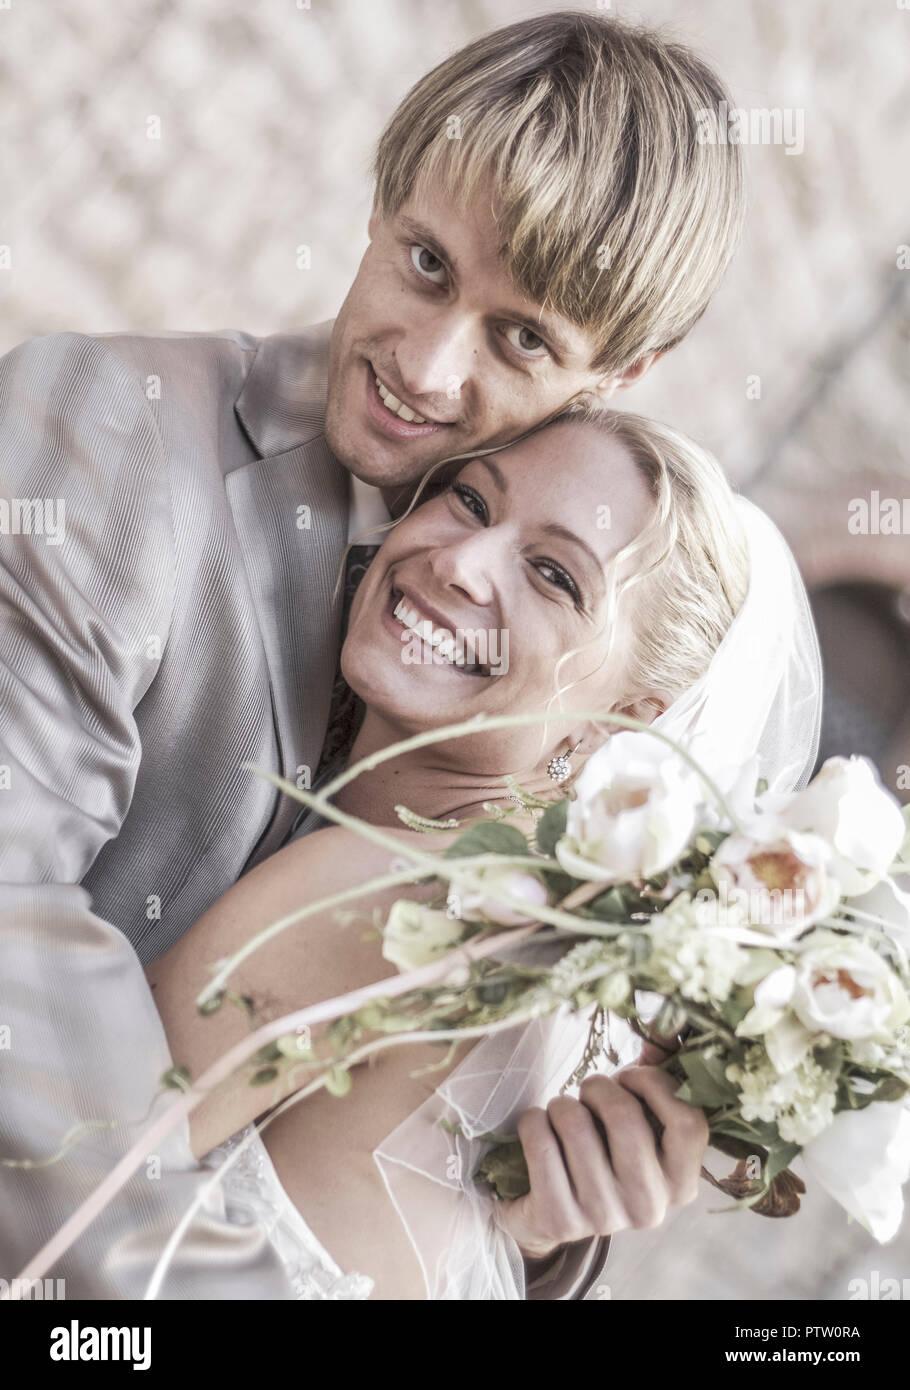 Brautpaar, umarmen sich (model-released) Stock Photo